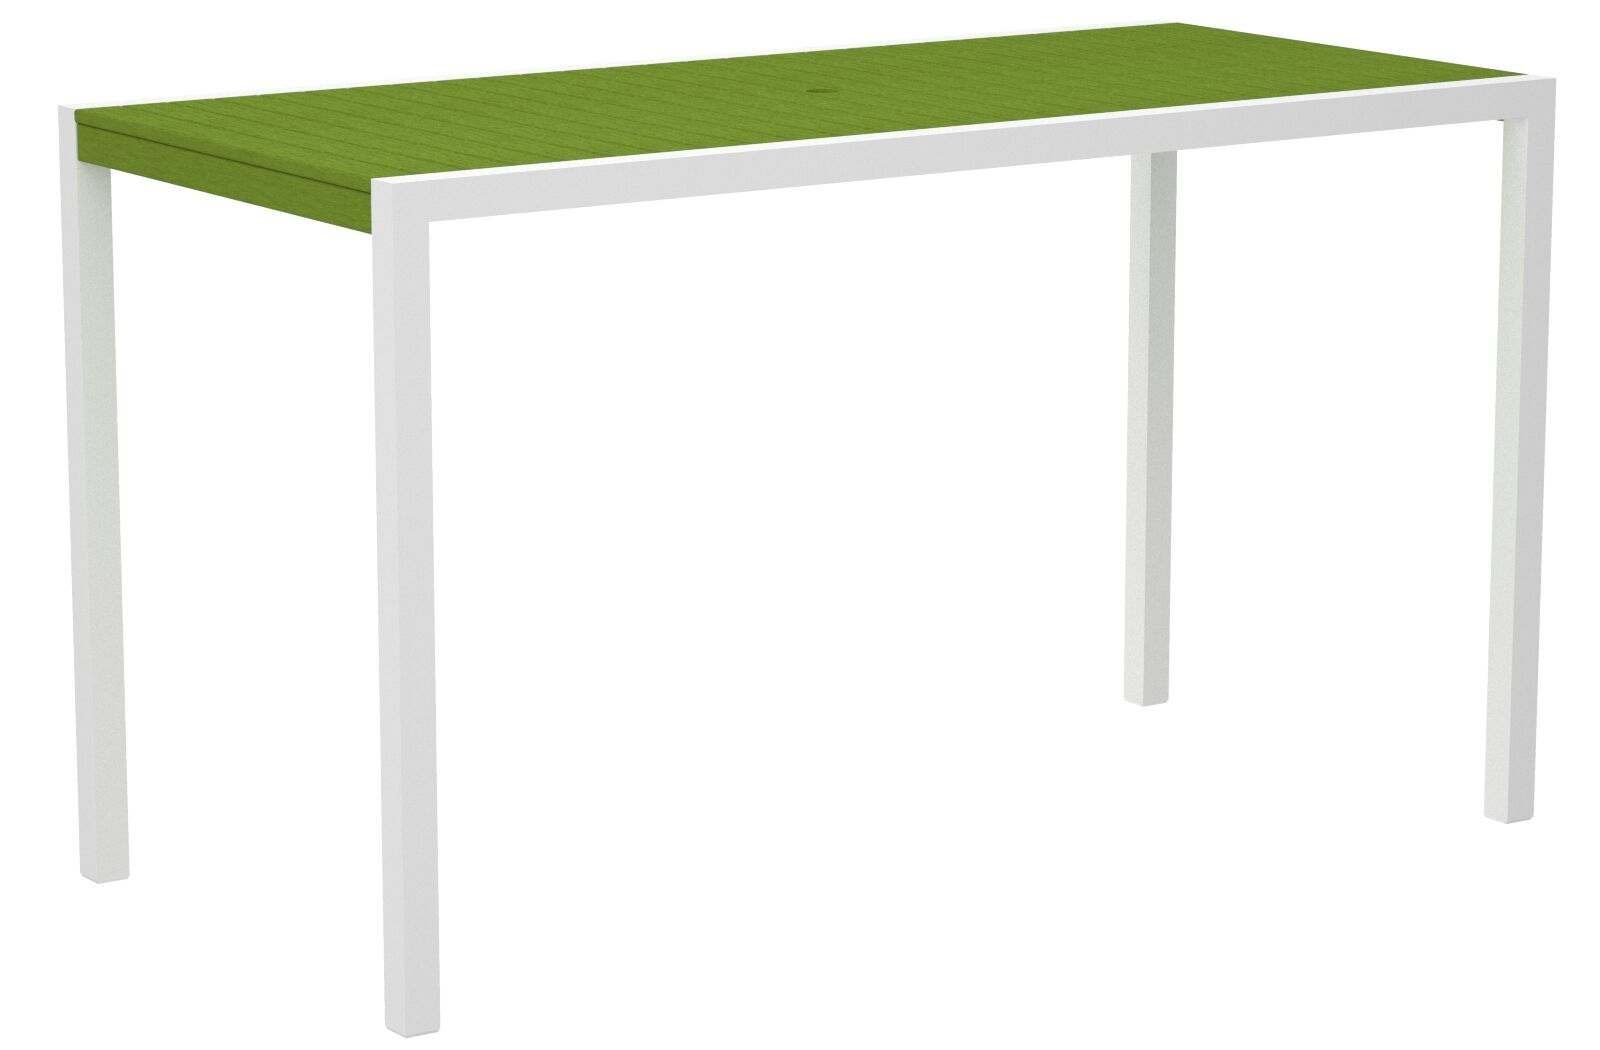 Mod Bar Table Top Finish: Lime, Base Finish: Textured White